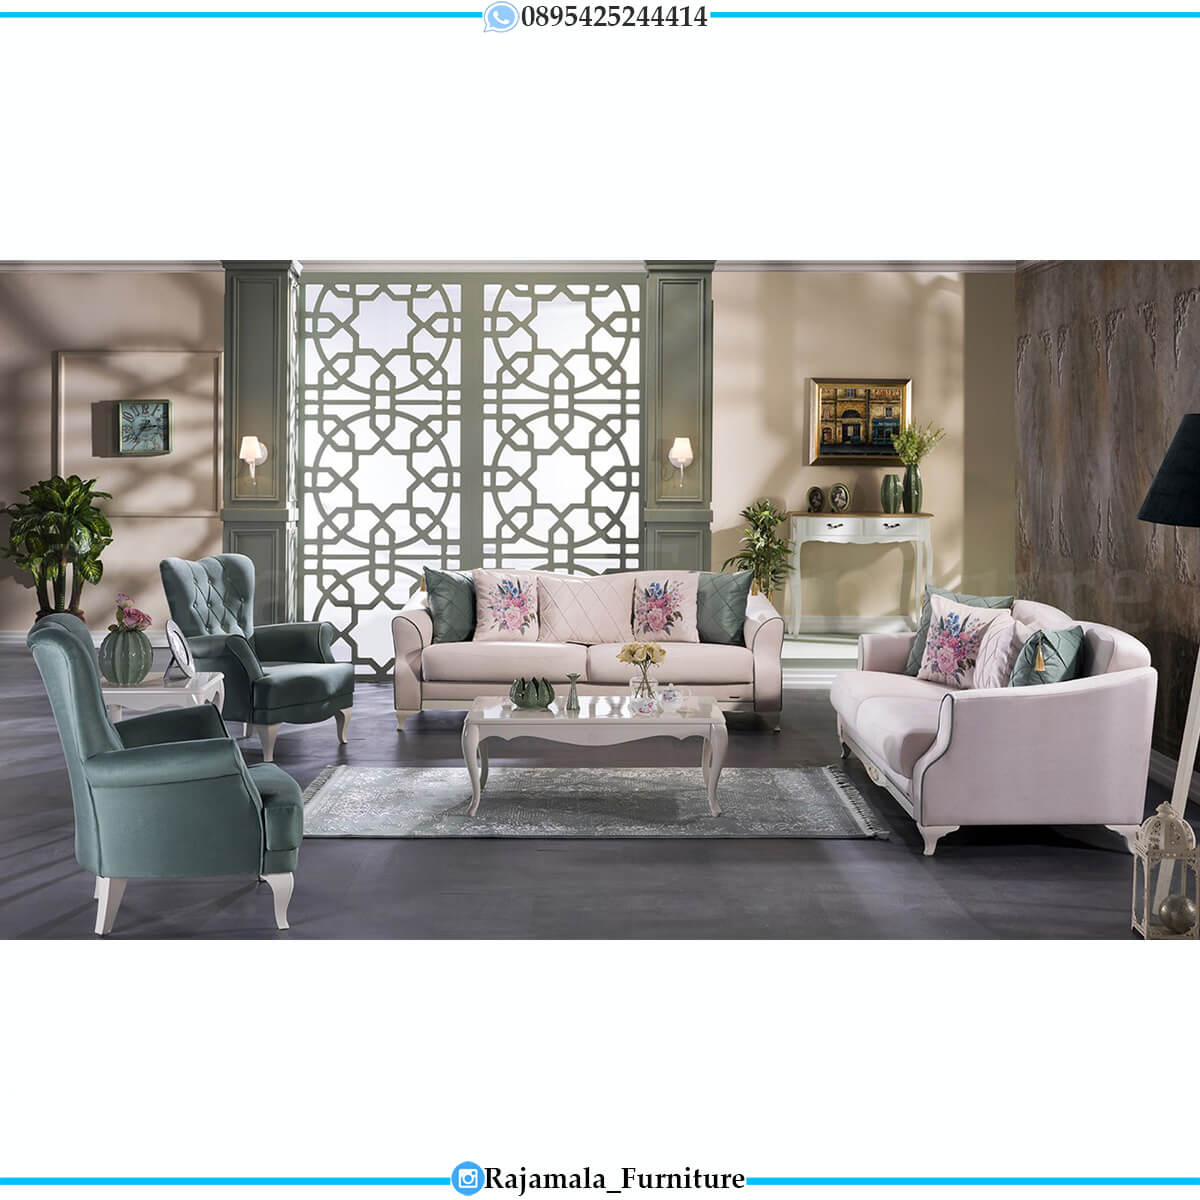 Sofa Minimalis Terbaru Shabby Chic Elegant Luxury Design RM-0627